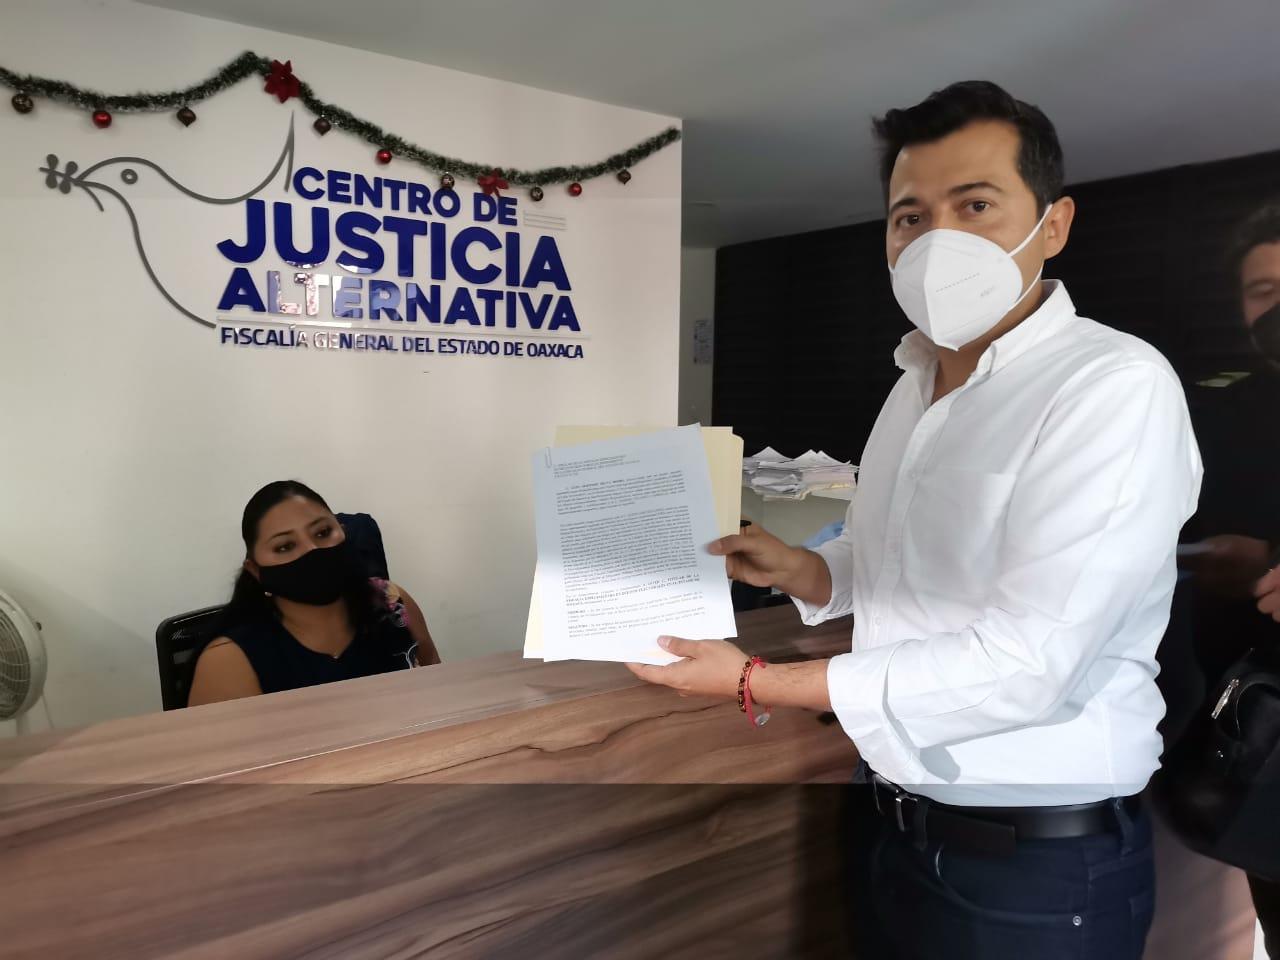 Justicia - Luis Alfonso Silva Romo